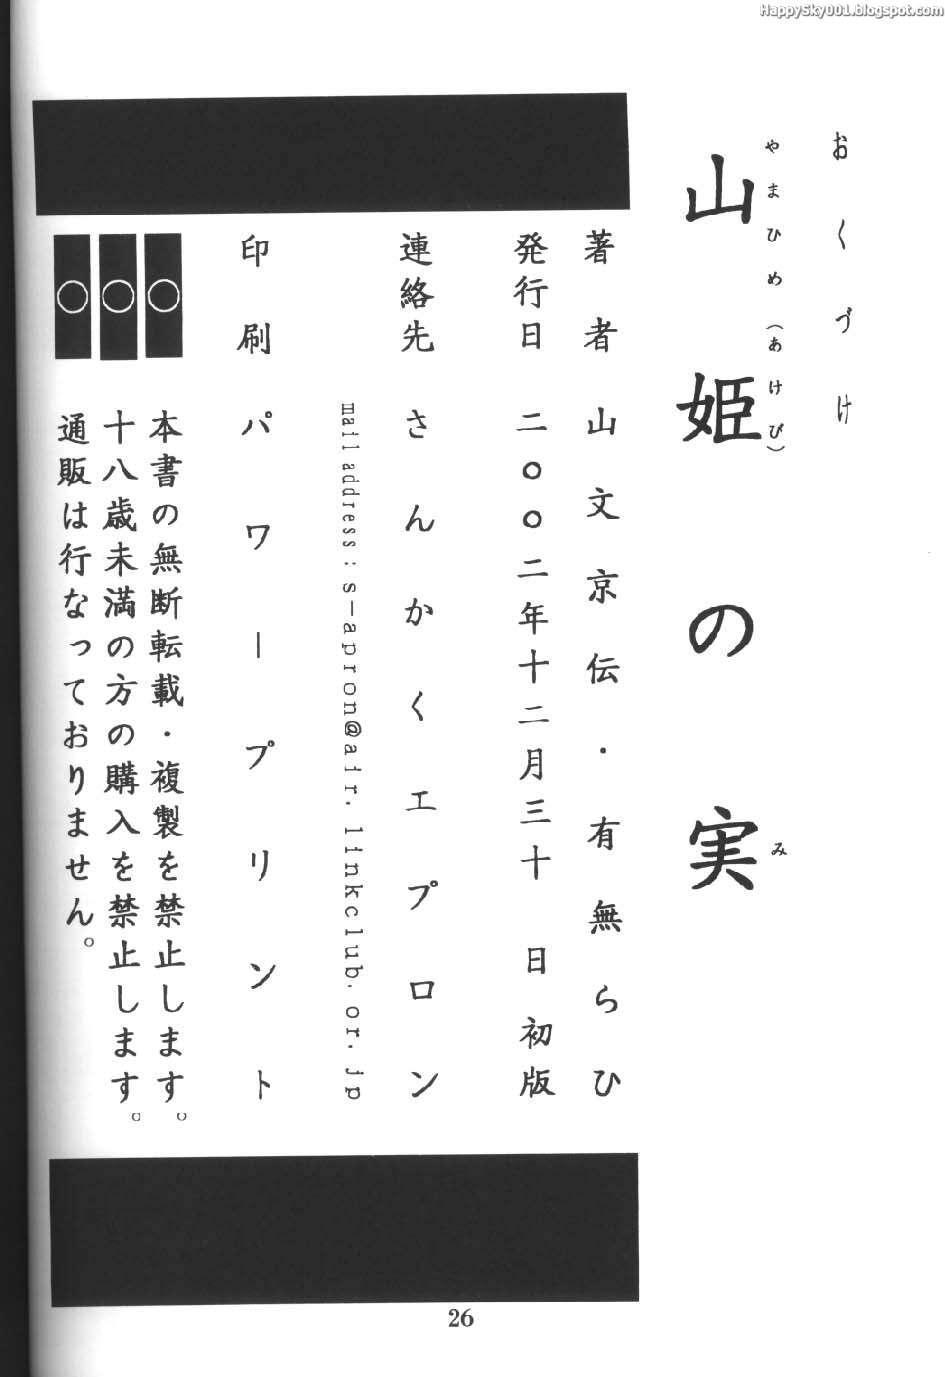 Yama Hime no Mi 24